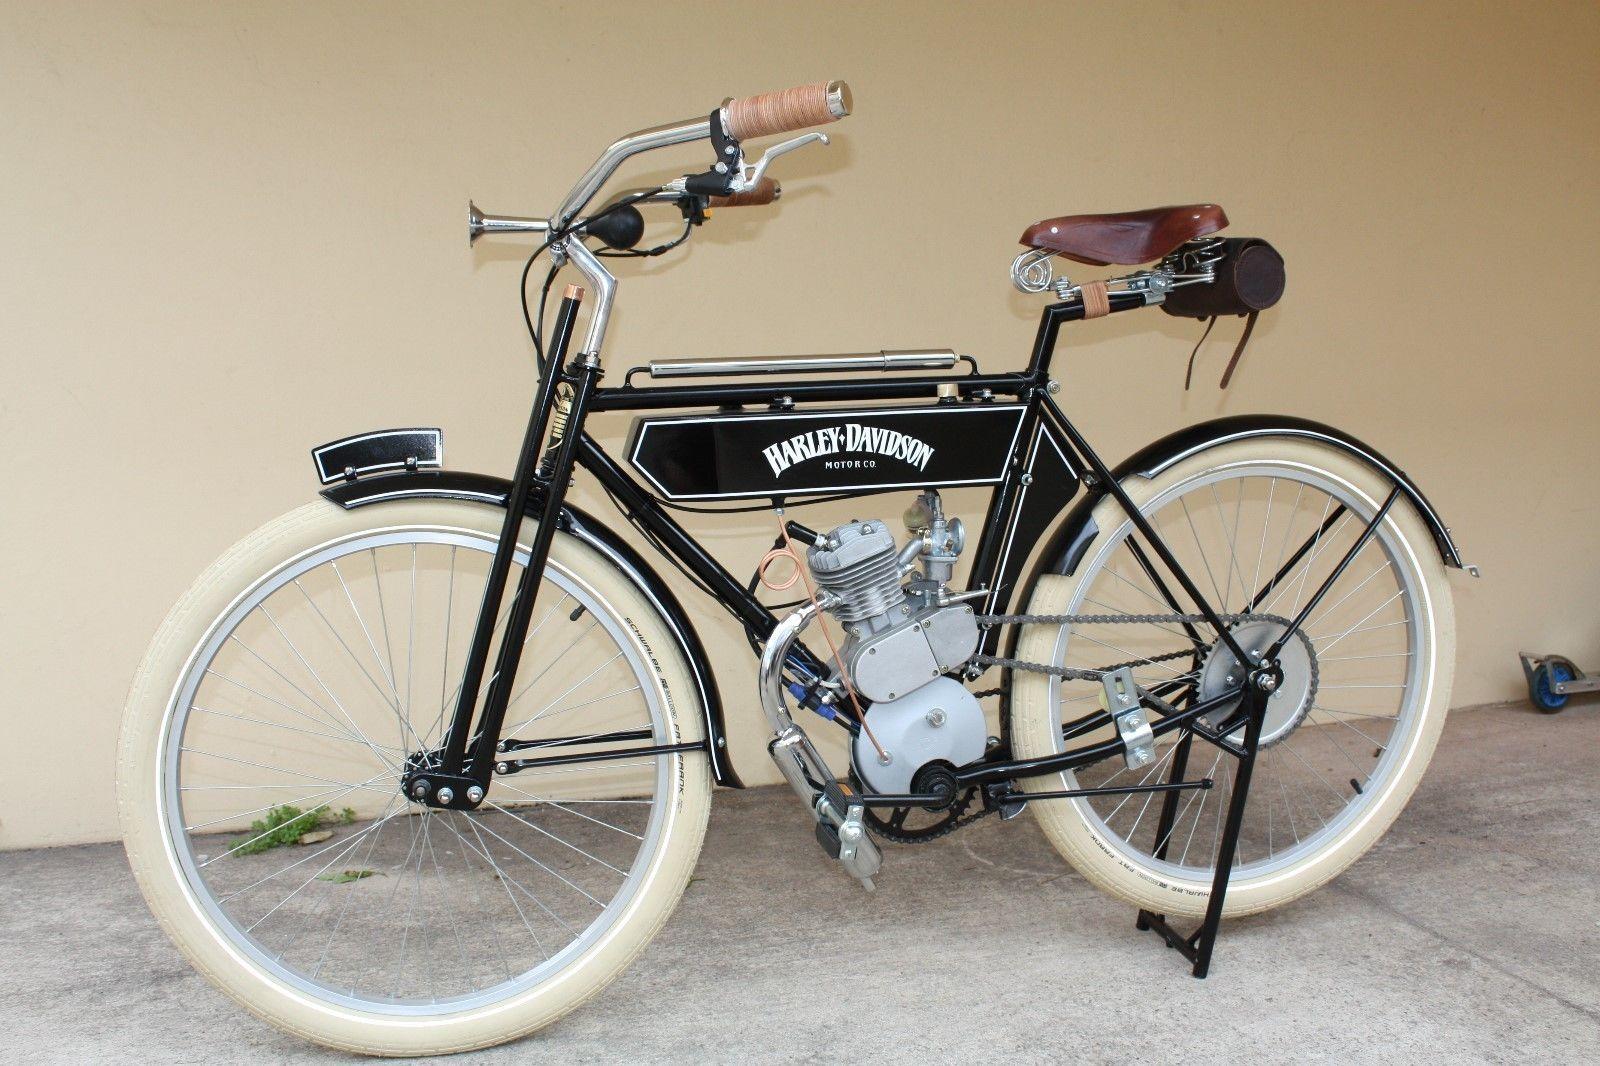 1904 Harley Davidson Style Motorized Bike